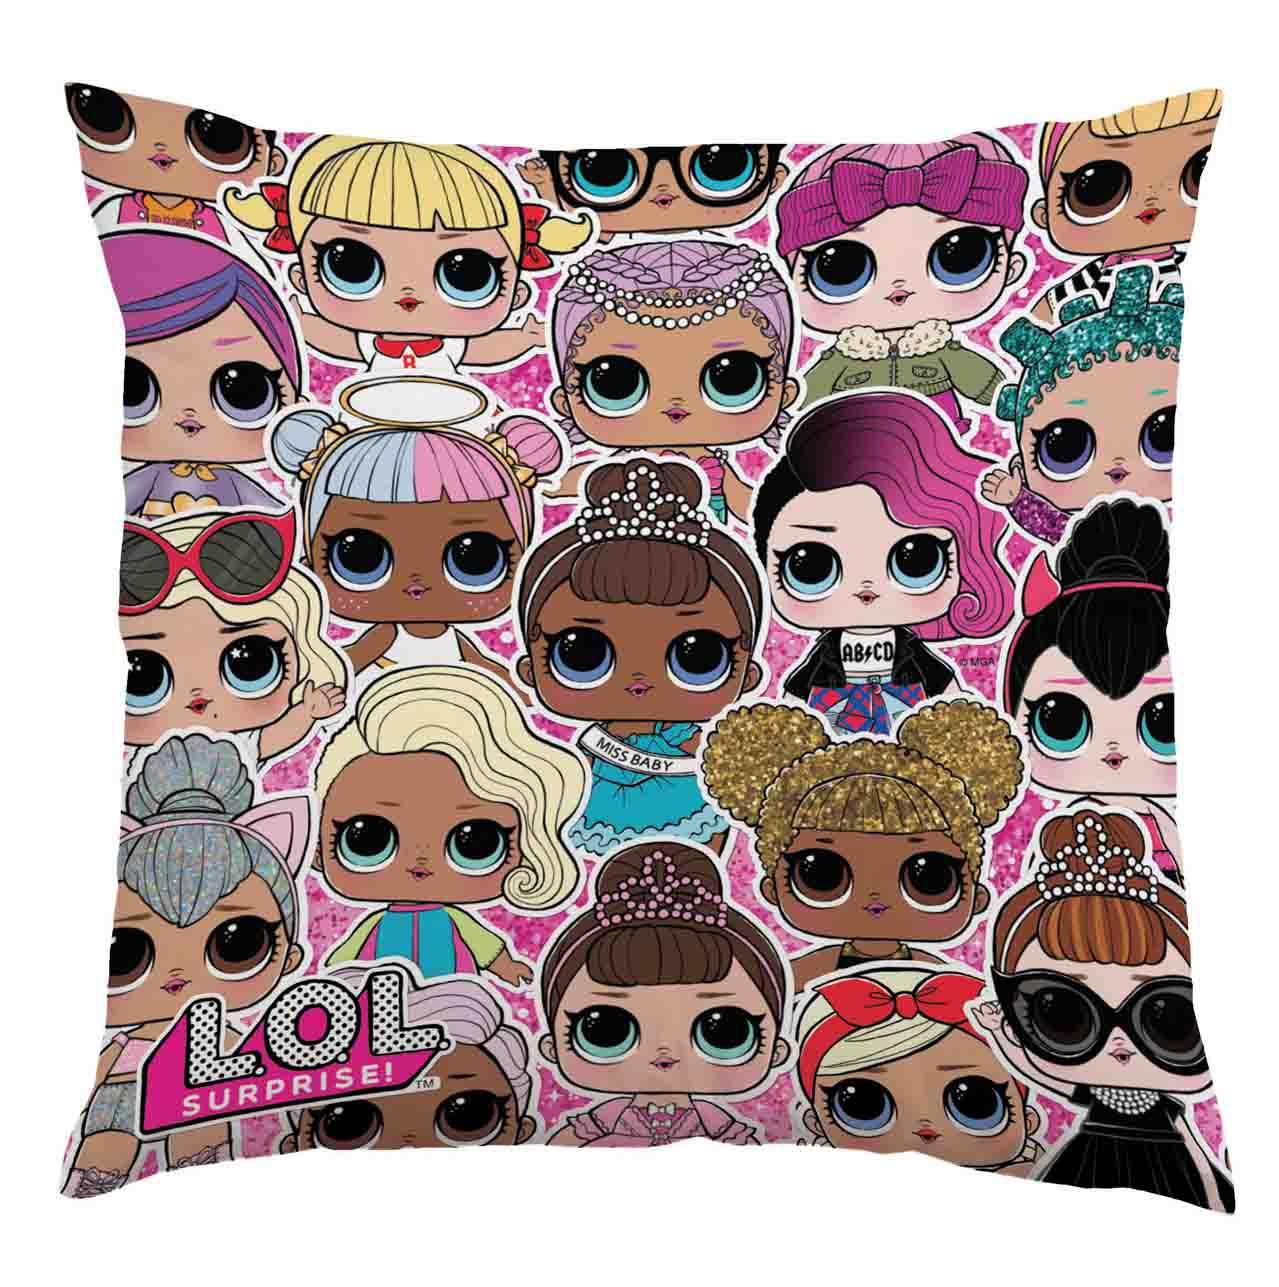 L.o.l. Surprise Printed Cushion